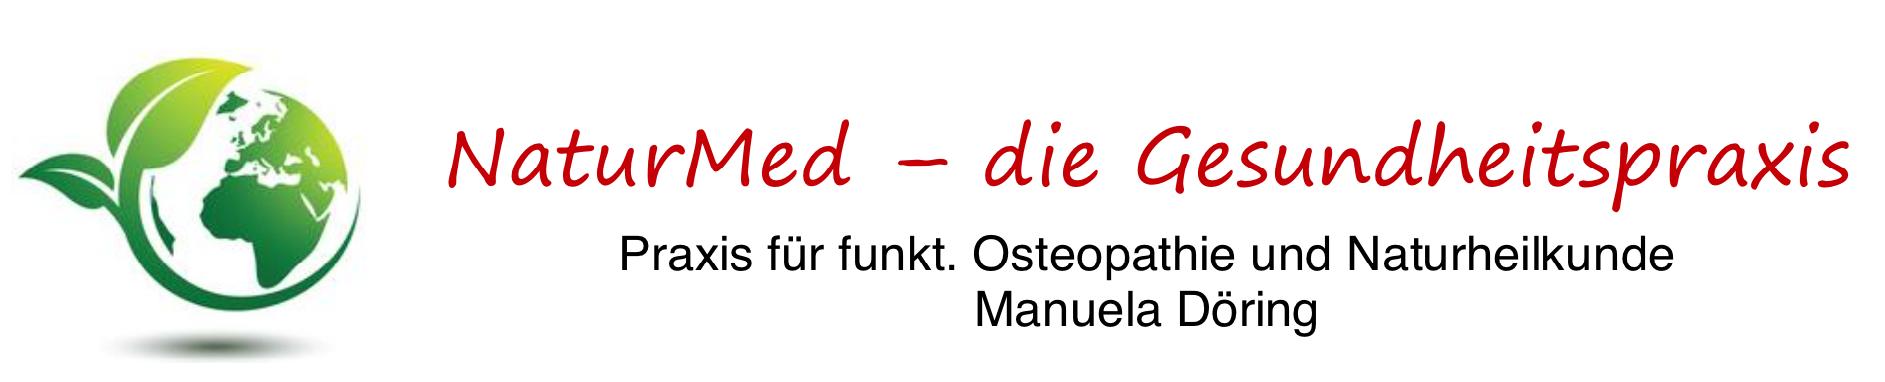 NaturMed-Gesundheitspraxis